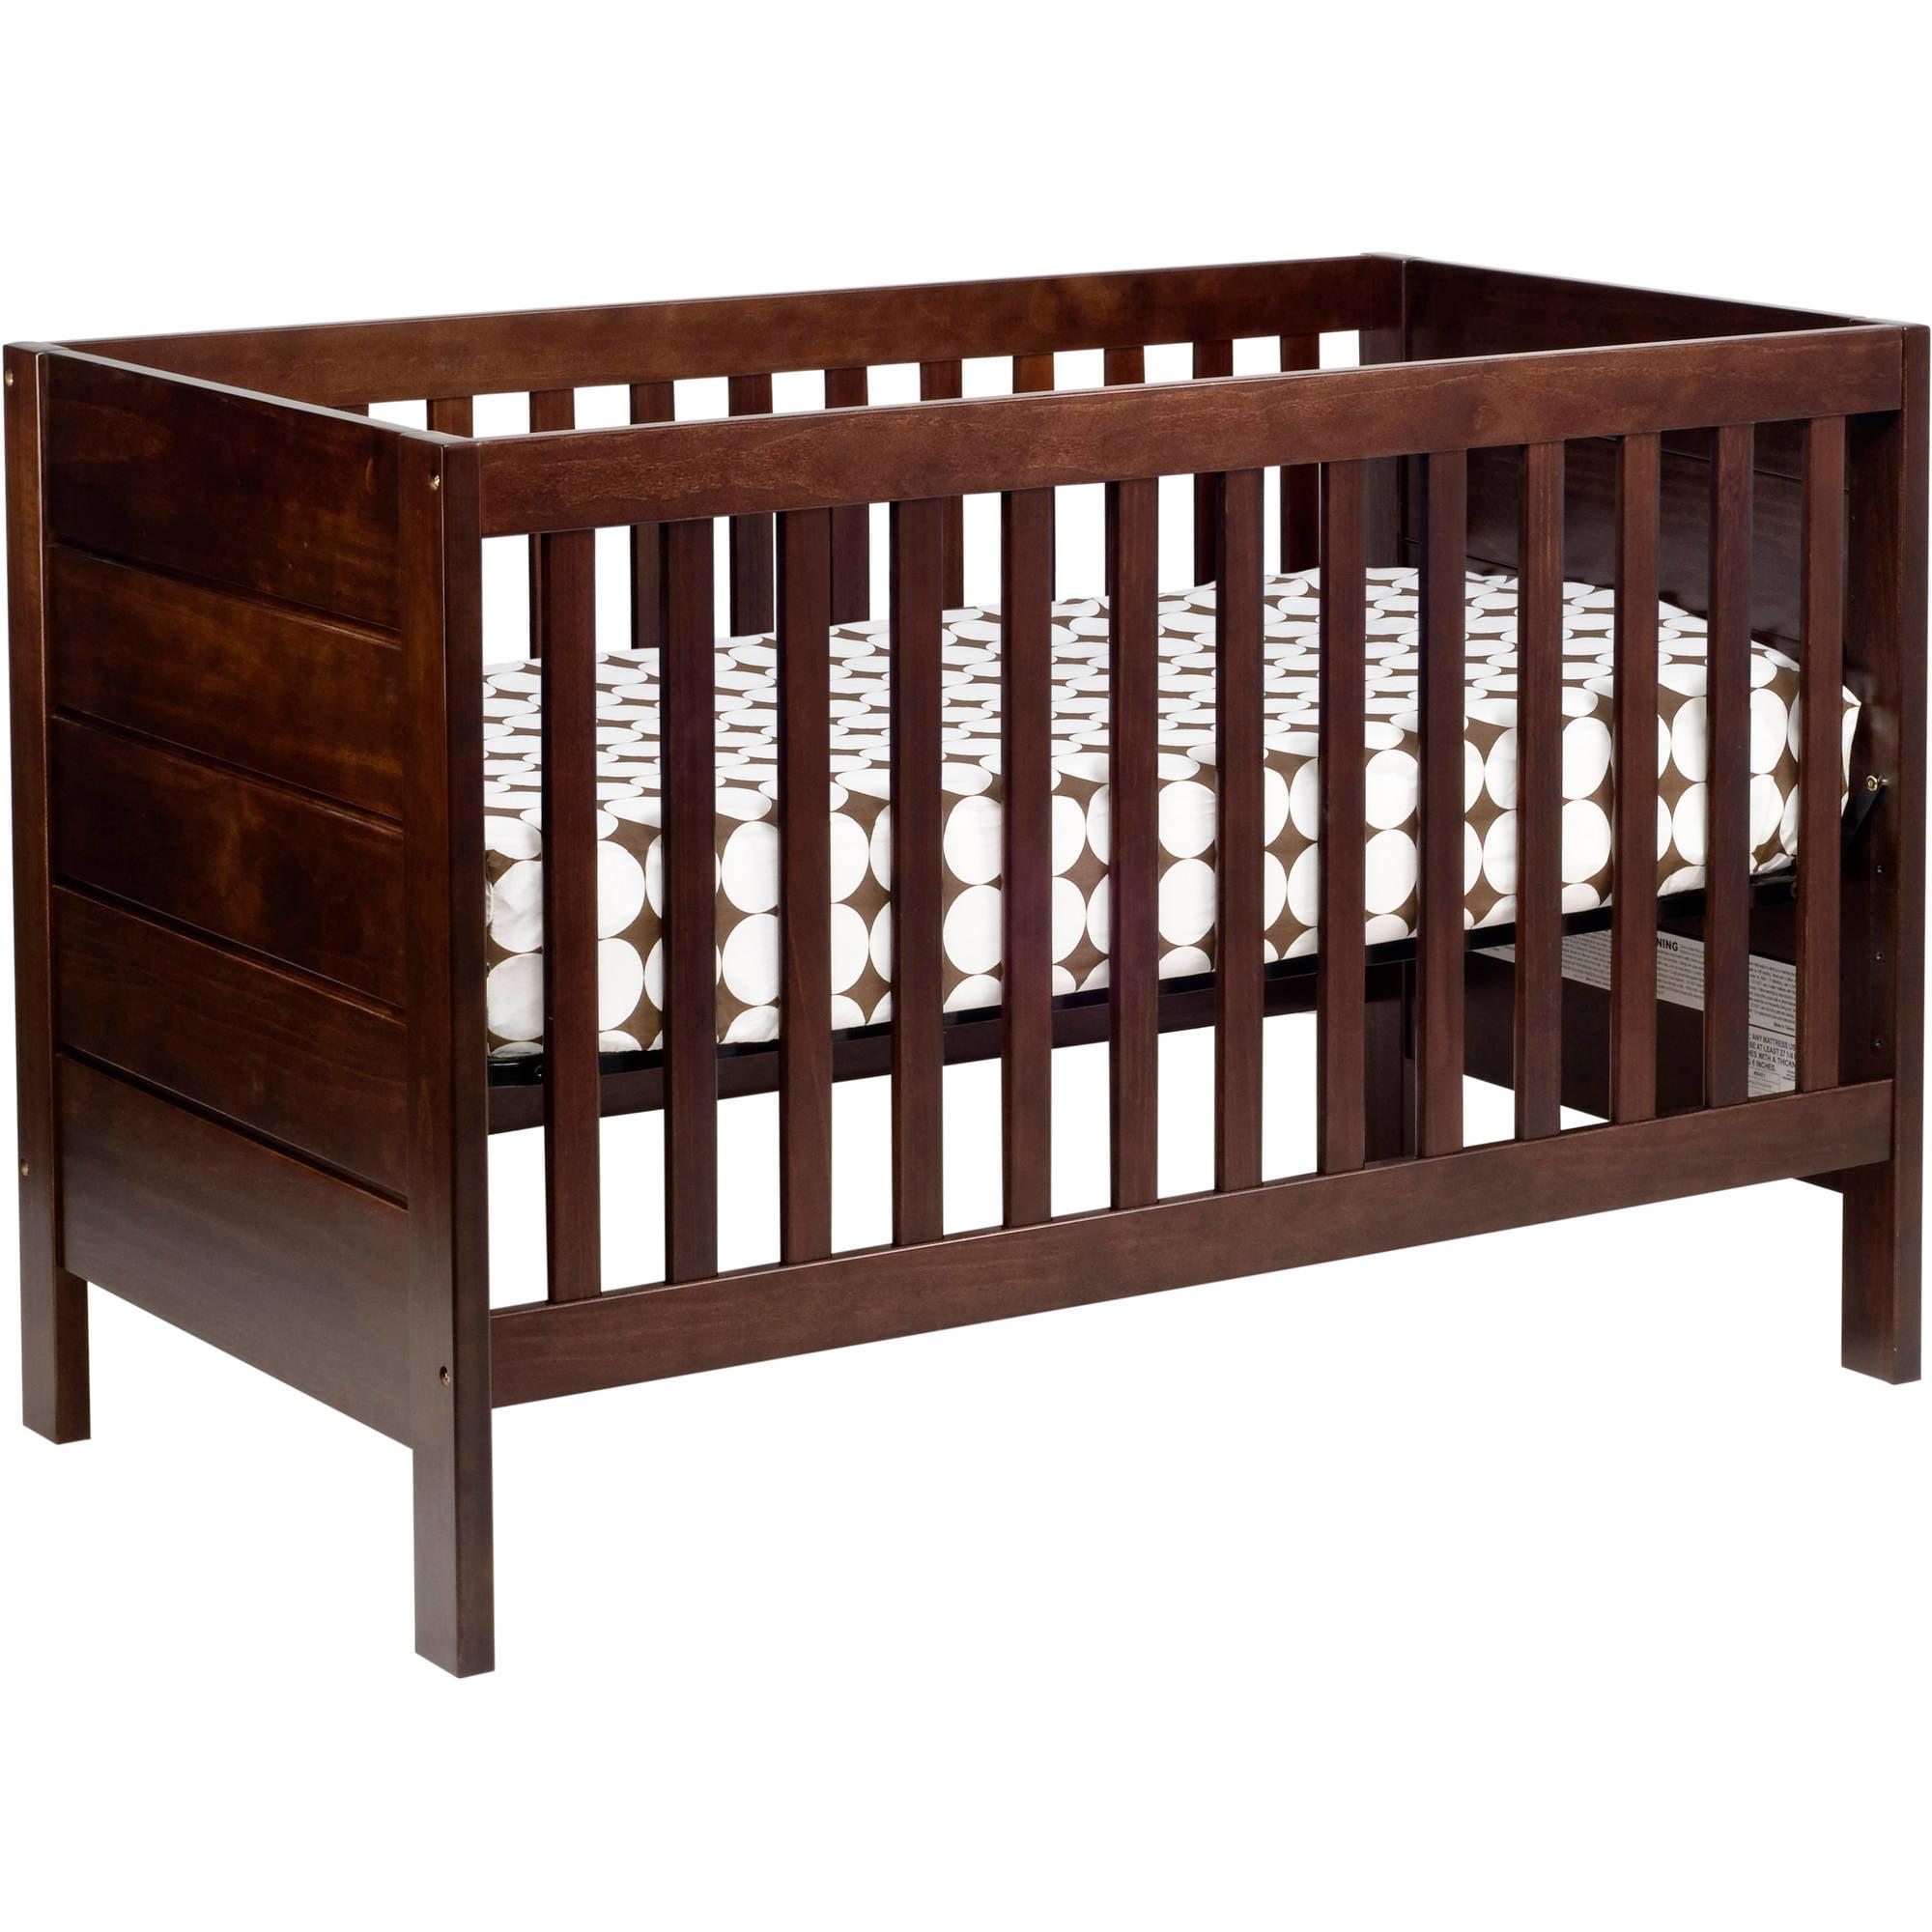 Baby cribs canada sale - Baby Cribs Canada Sale 24